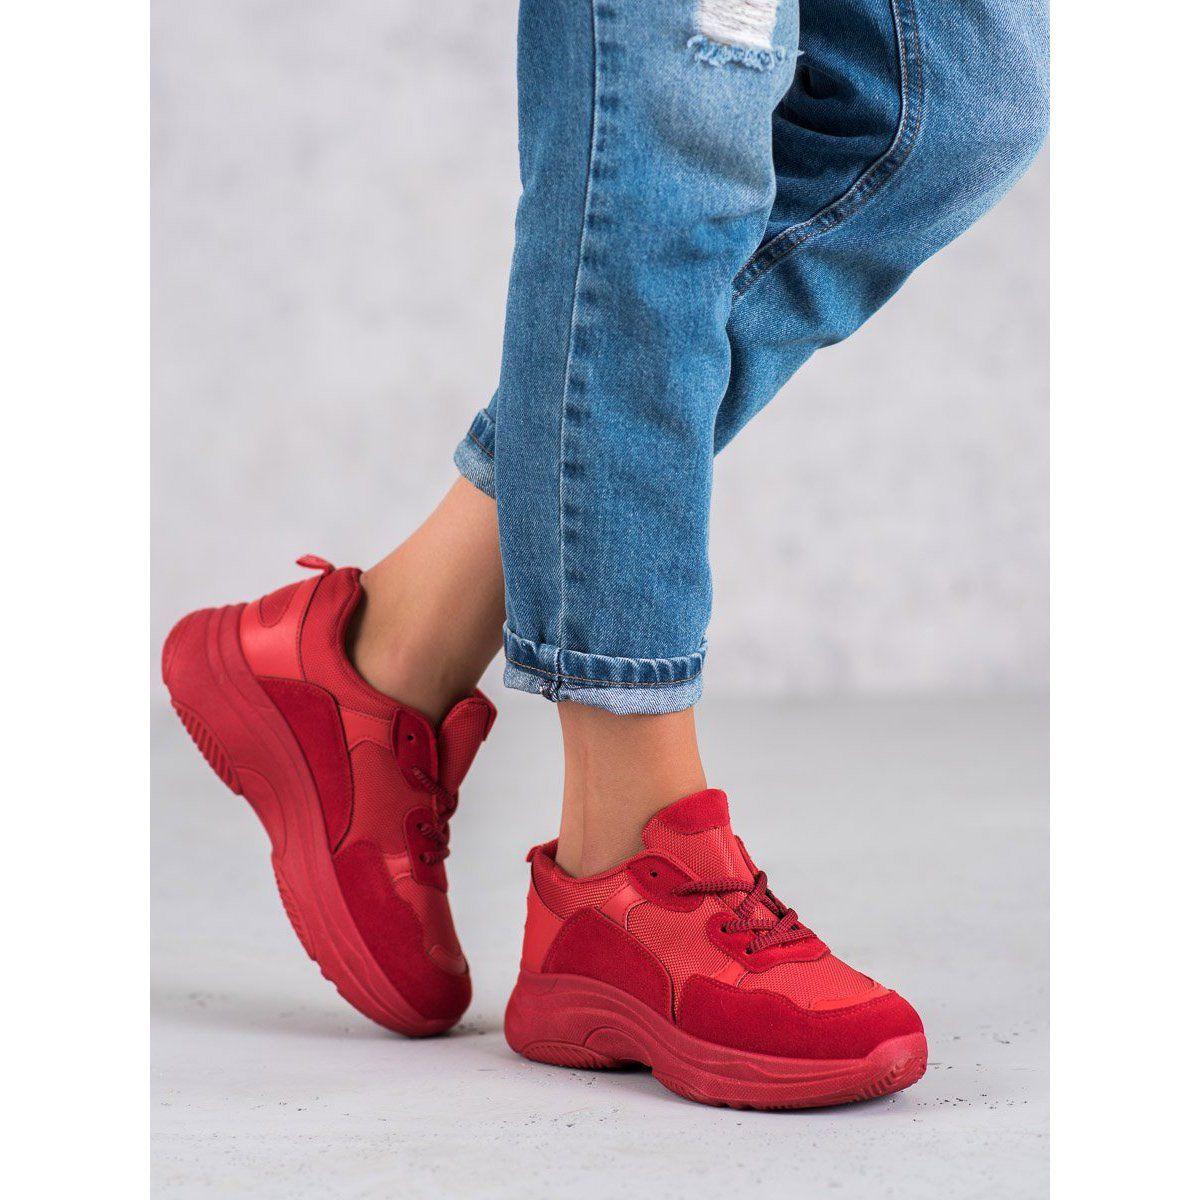 Shelovet Czerwone Buty Sportowe Wedge Sneaker Shoes Fashion